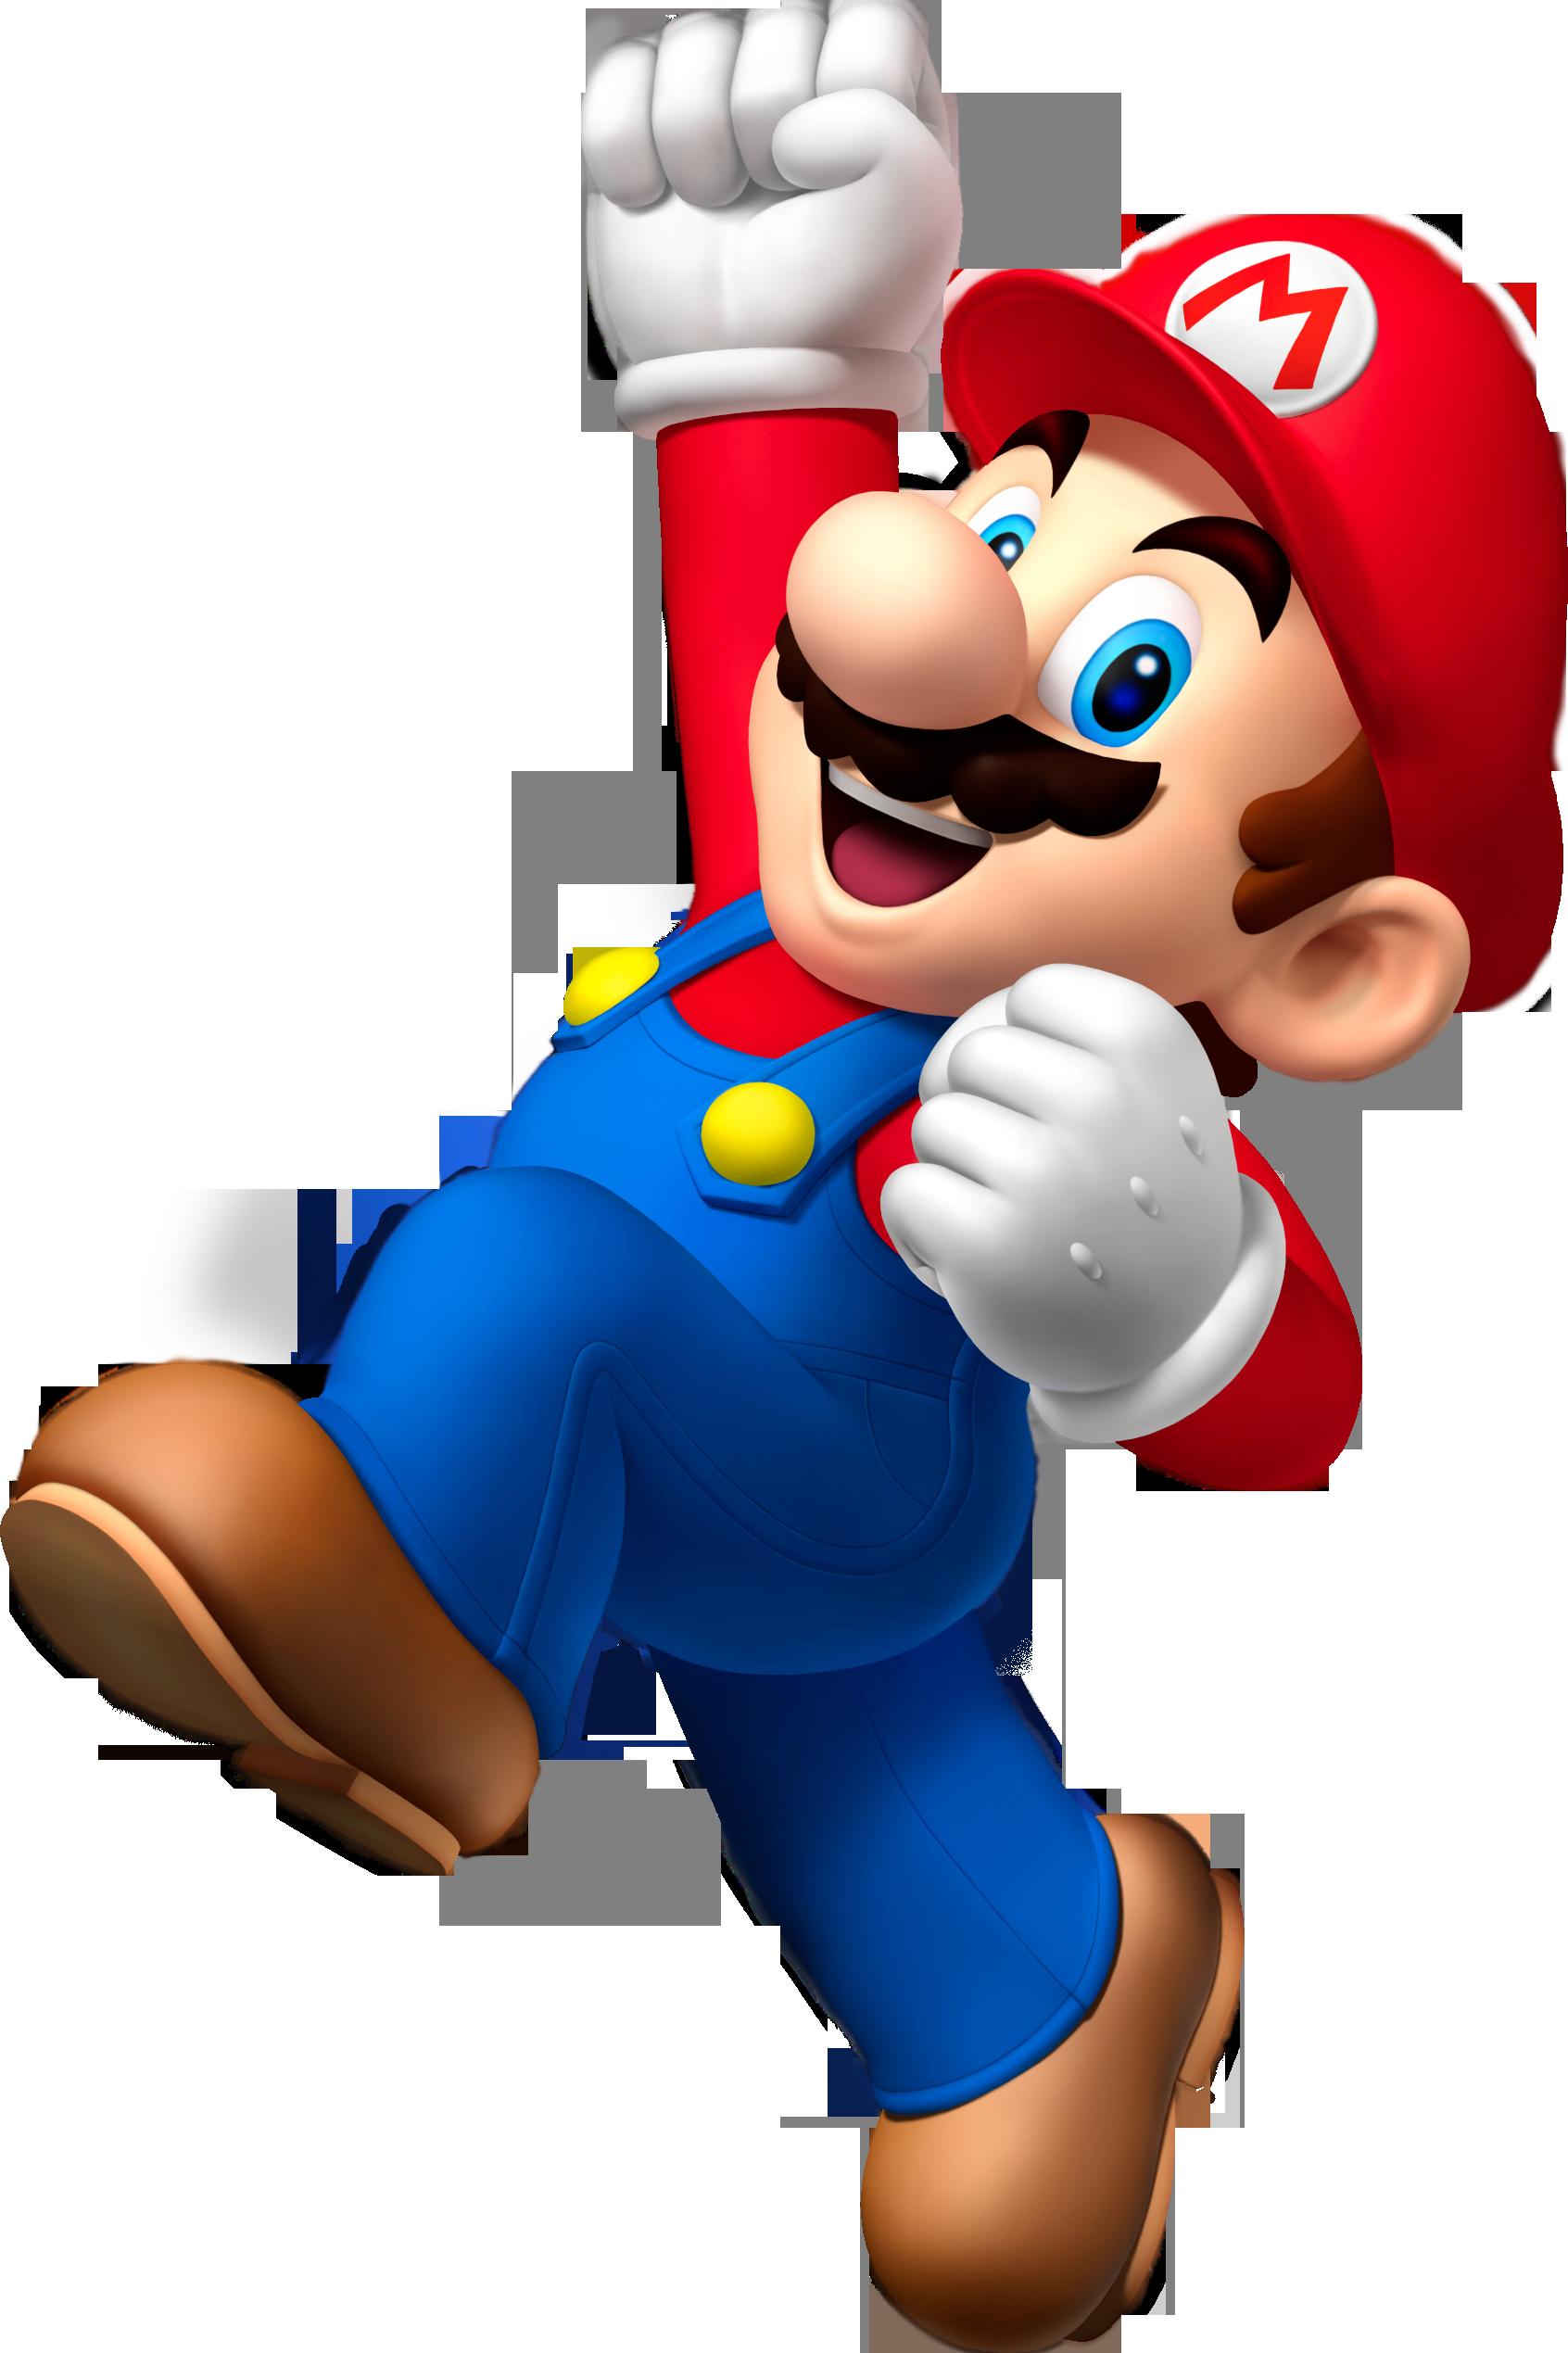 Mario Respect, Arcade and Giant bomb